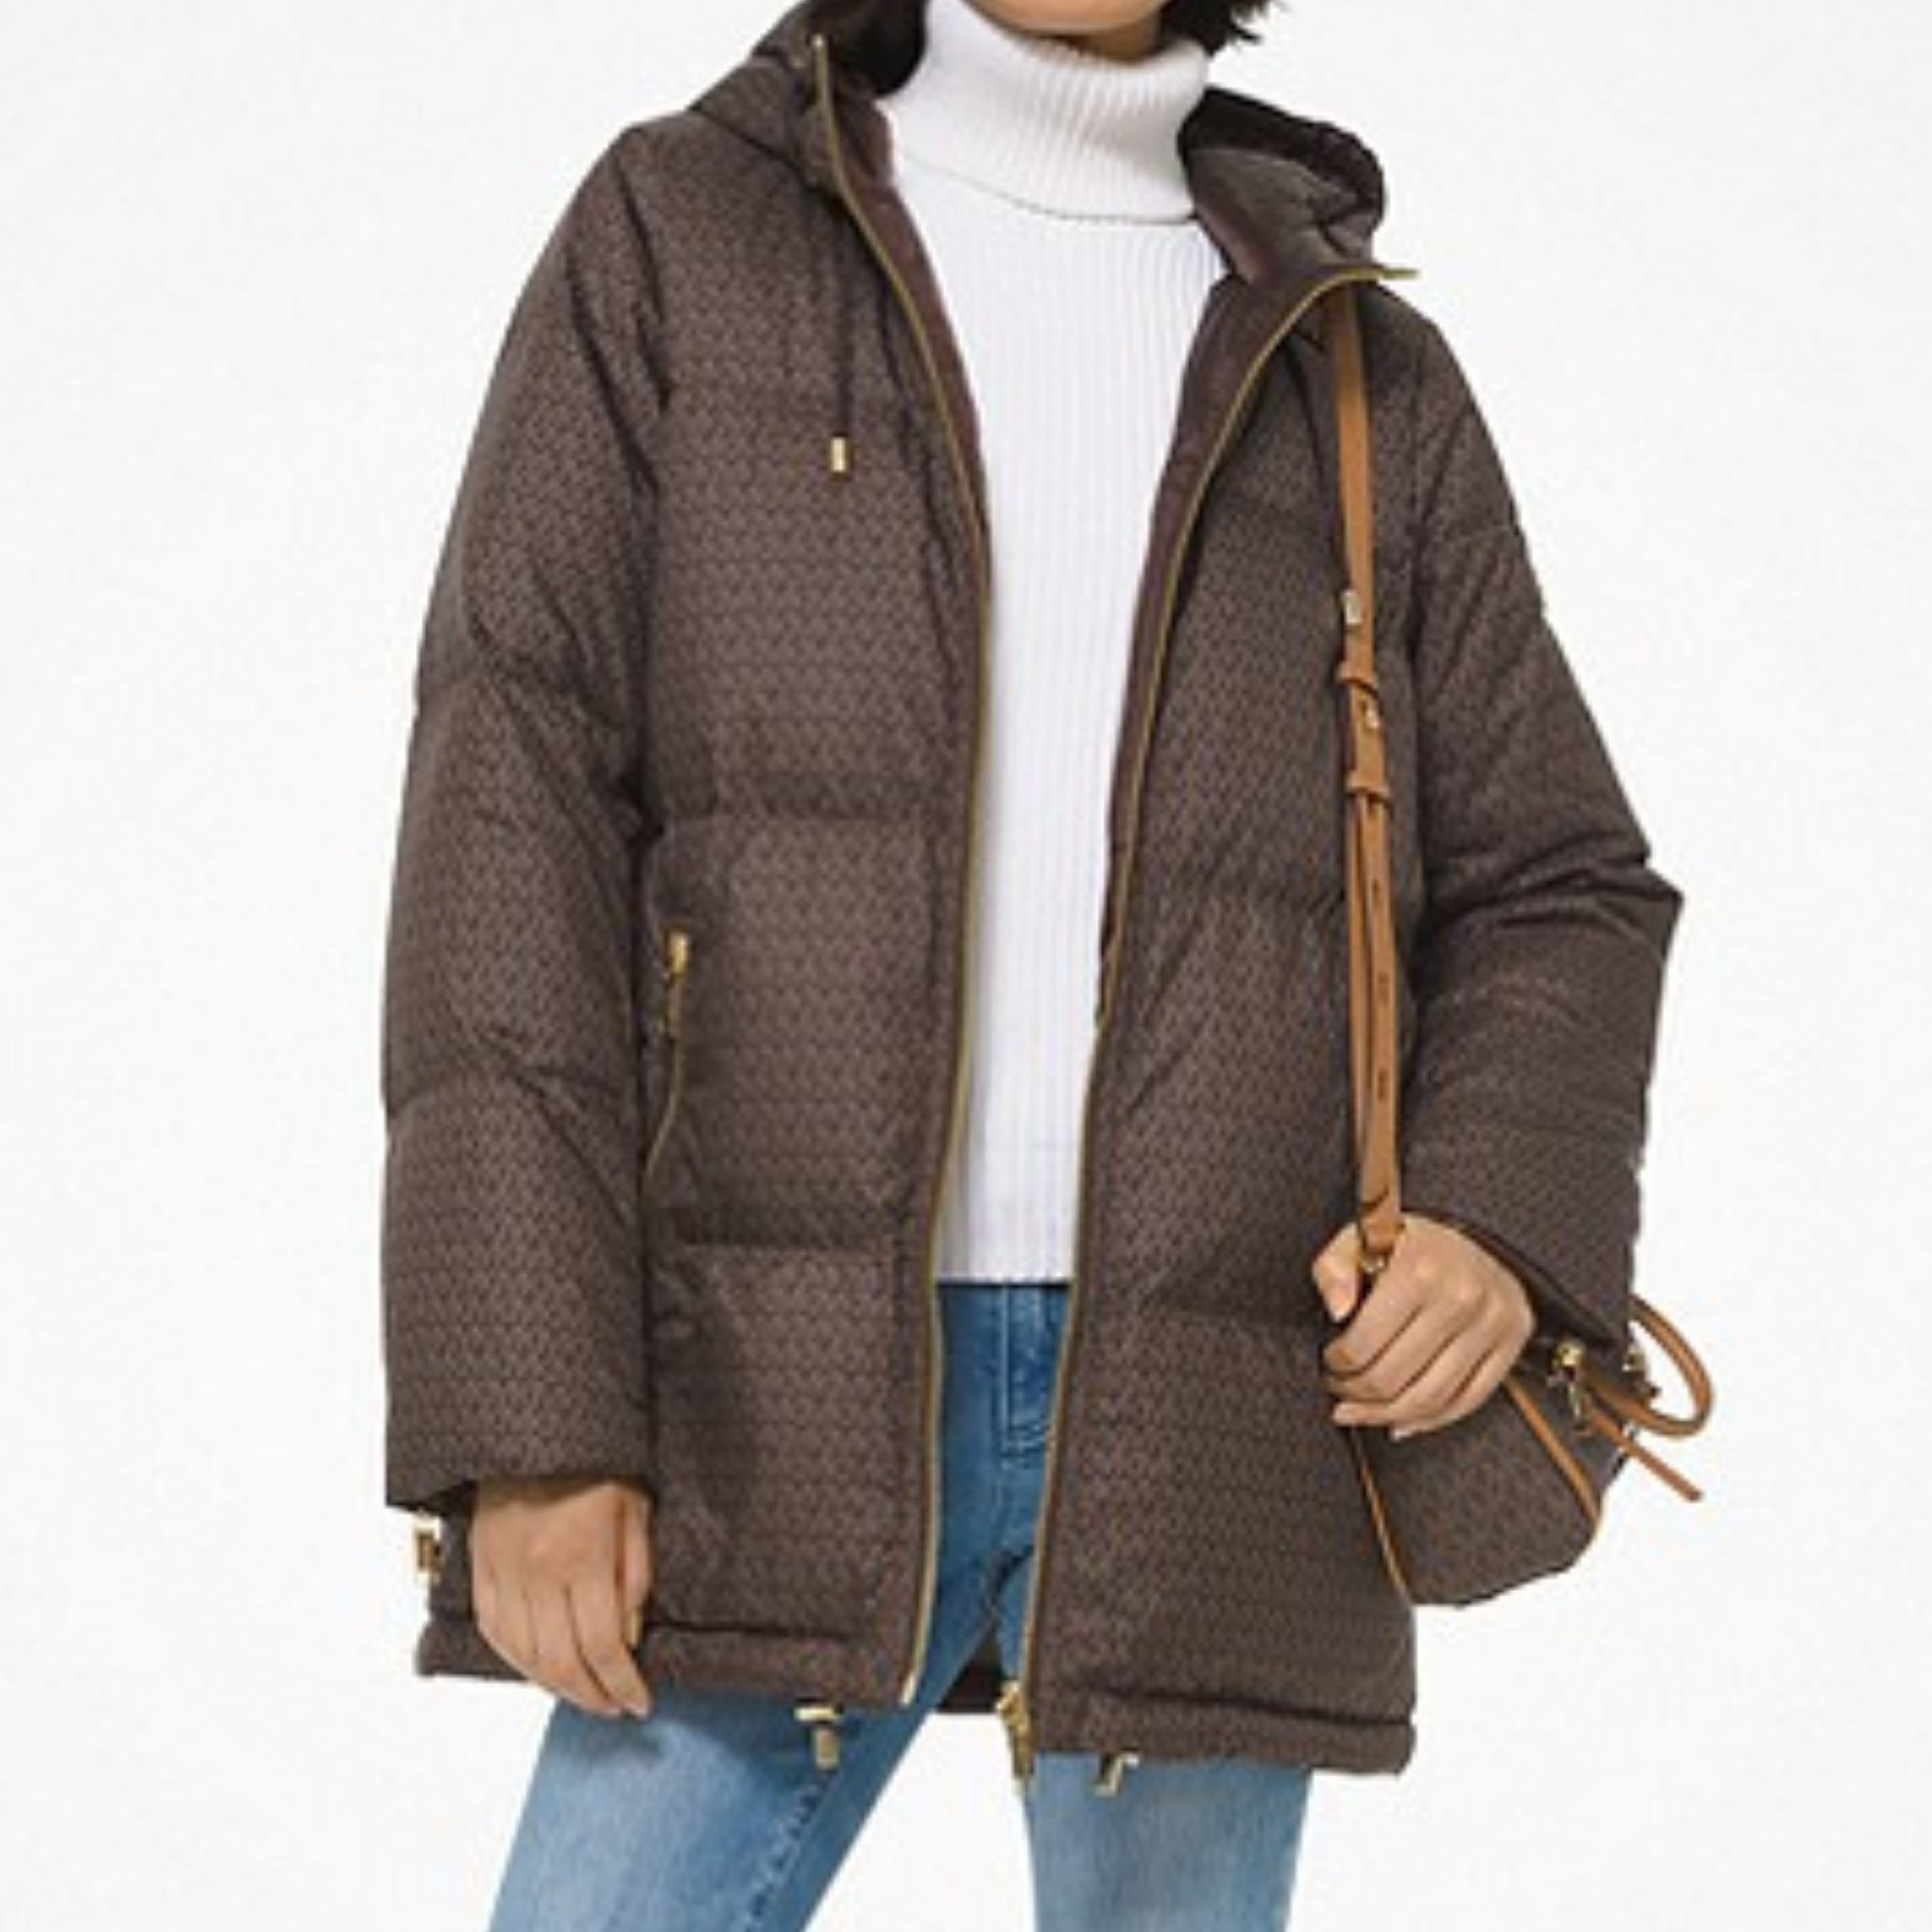 Brown puffer coat with handbag over shoulder